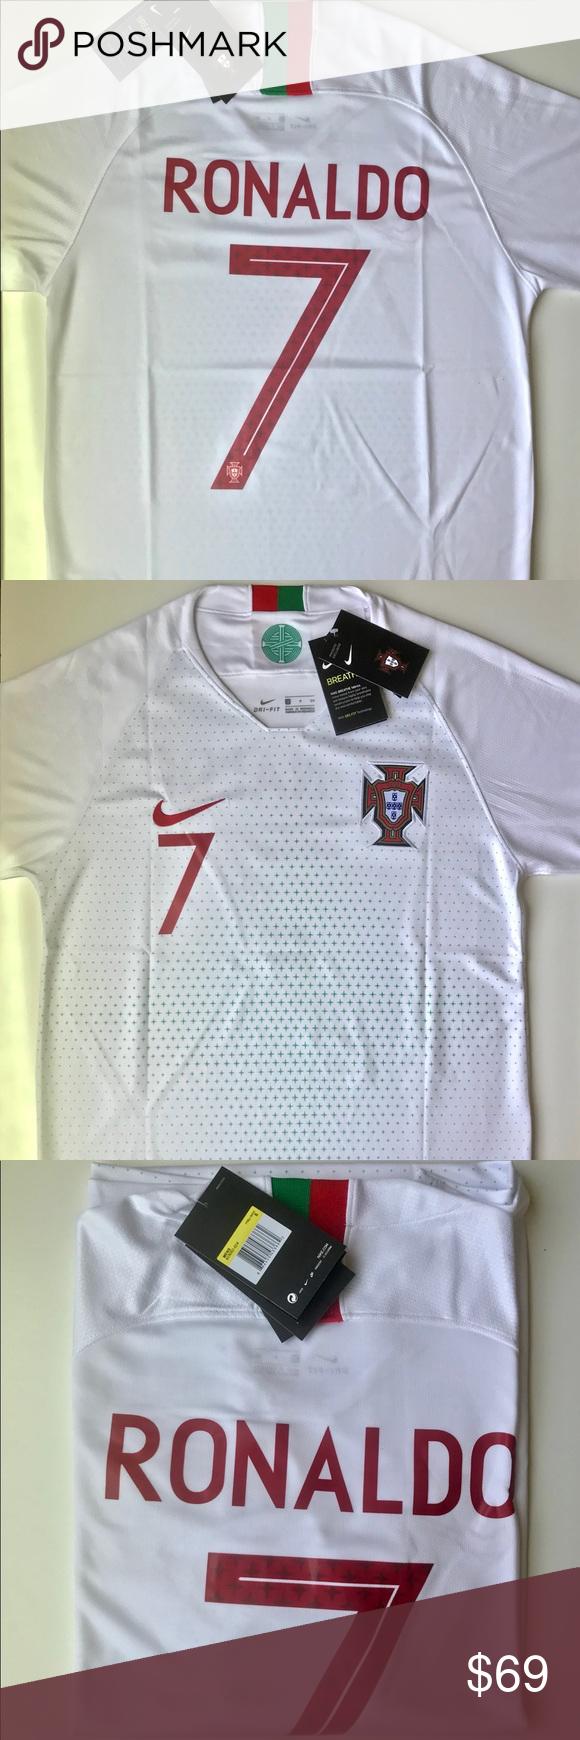 New Ronaldo Portugal Nike Soccer World Cup Jersey 2018 World Cup Portugal National Team Nike Ronaldo 7 White Away S Nike Soccer World Cup Jerseys Soccer World